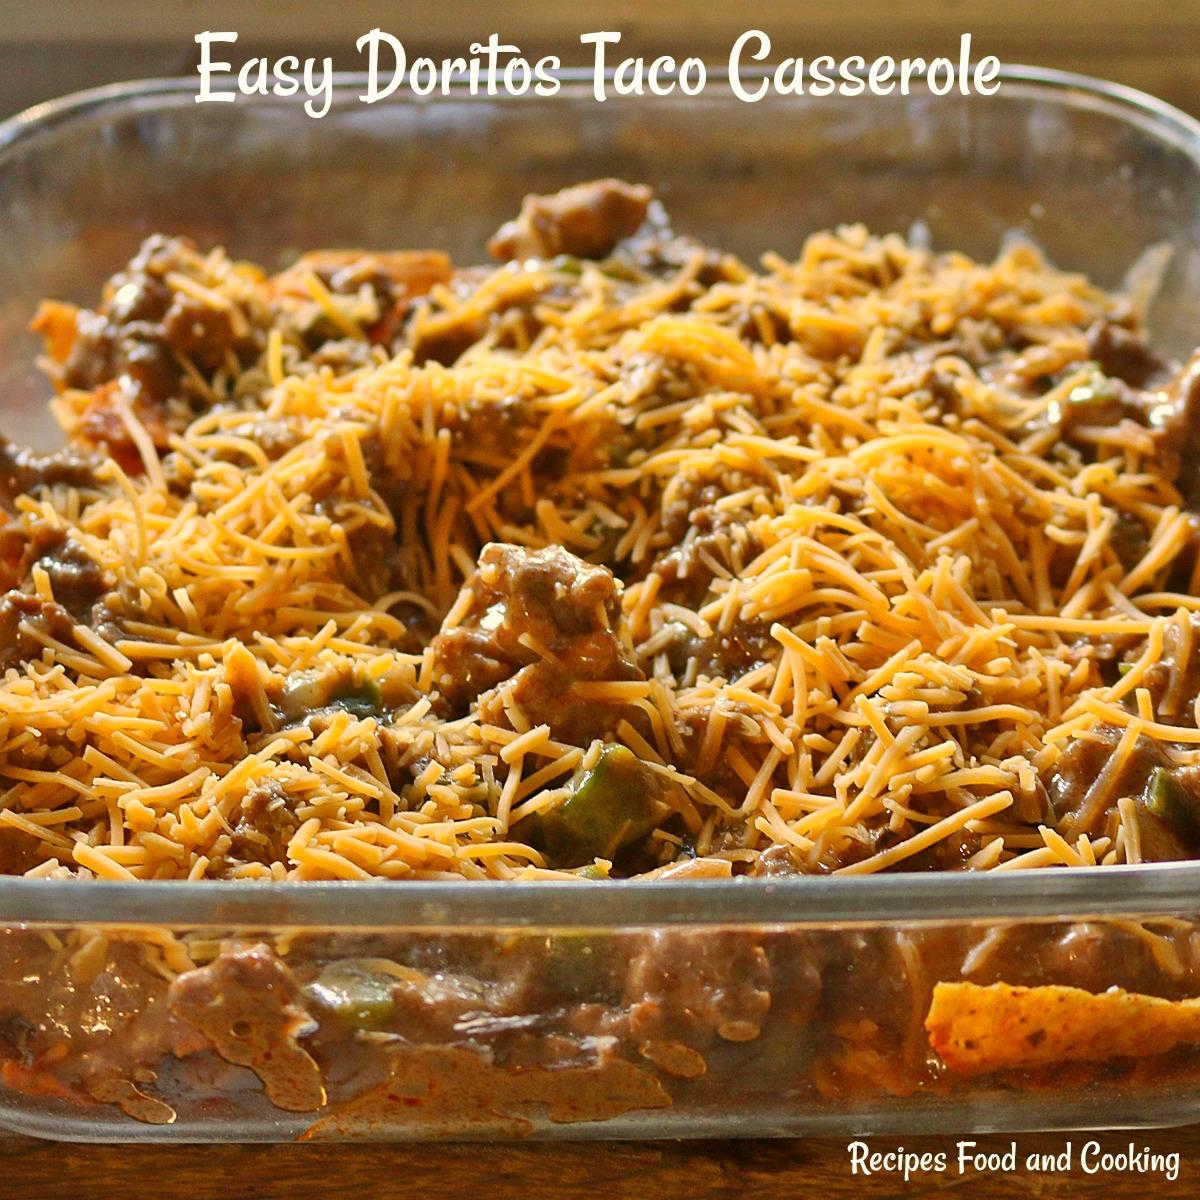 Easy Doritos Taco Casserole